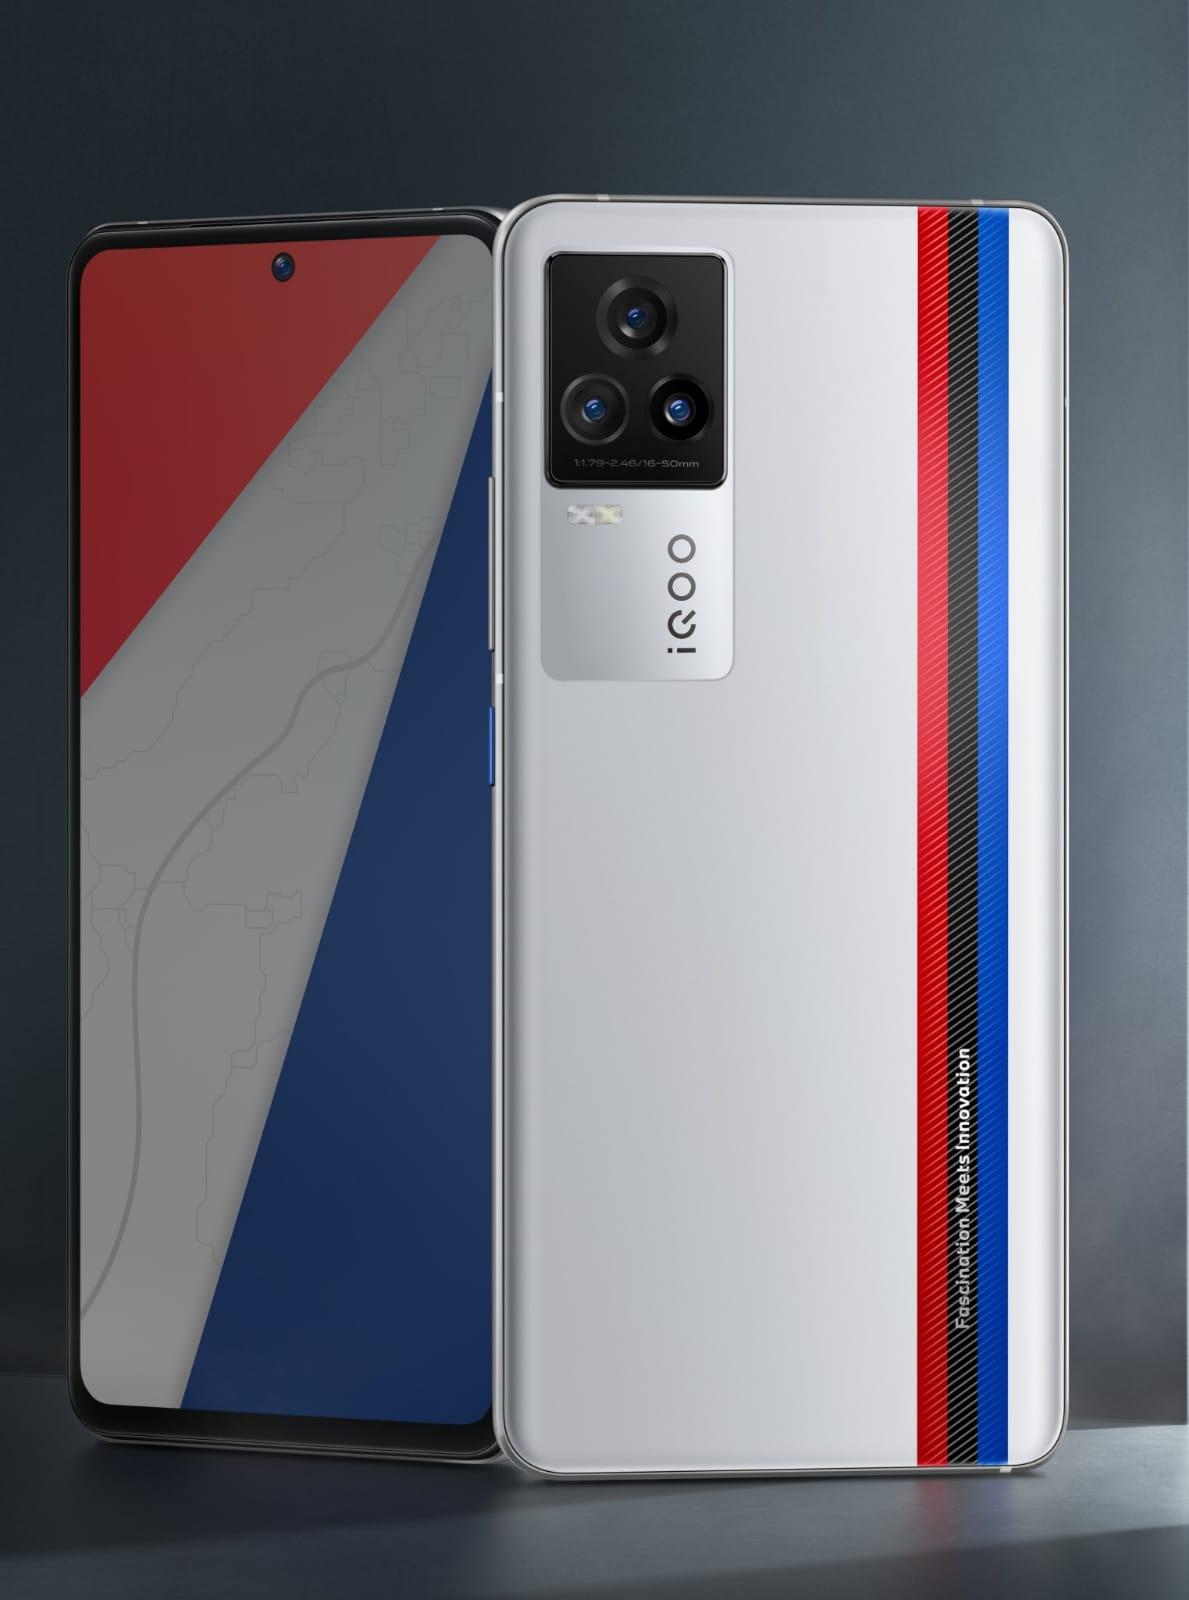 iQoo 7 gcam apk 8.1 (Google Camera)